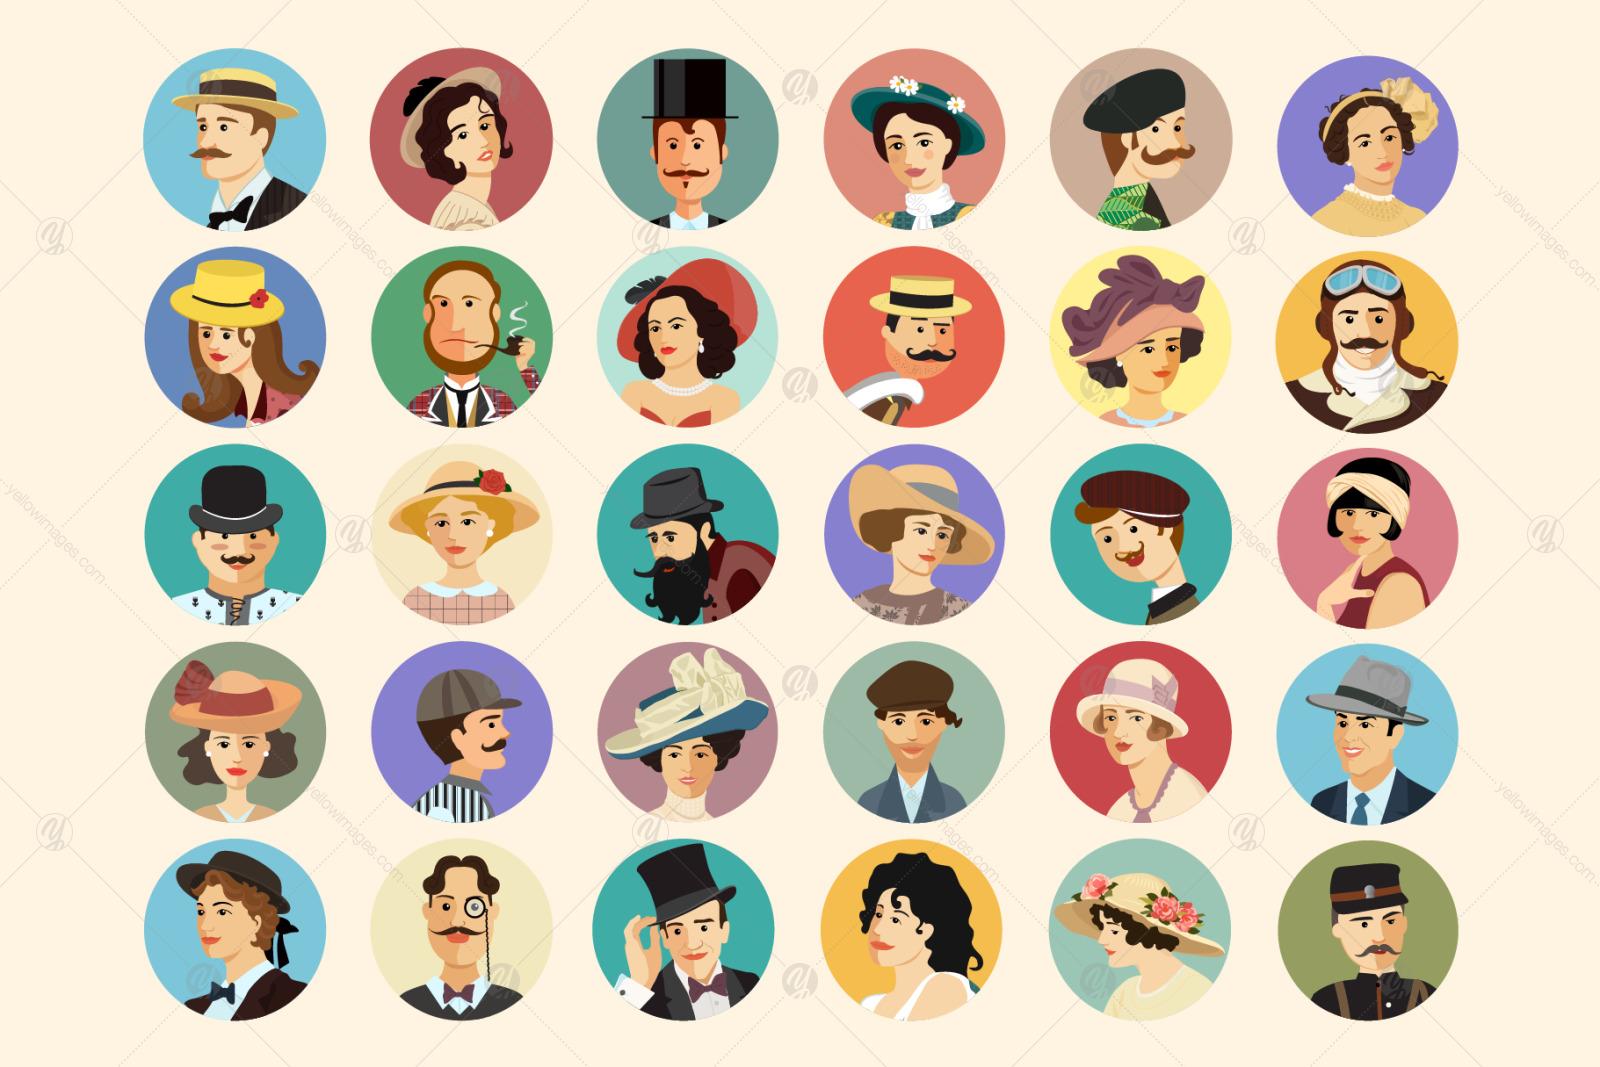 Avatars Retro people vector cartoon illustrations